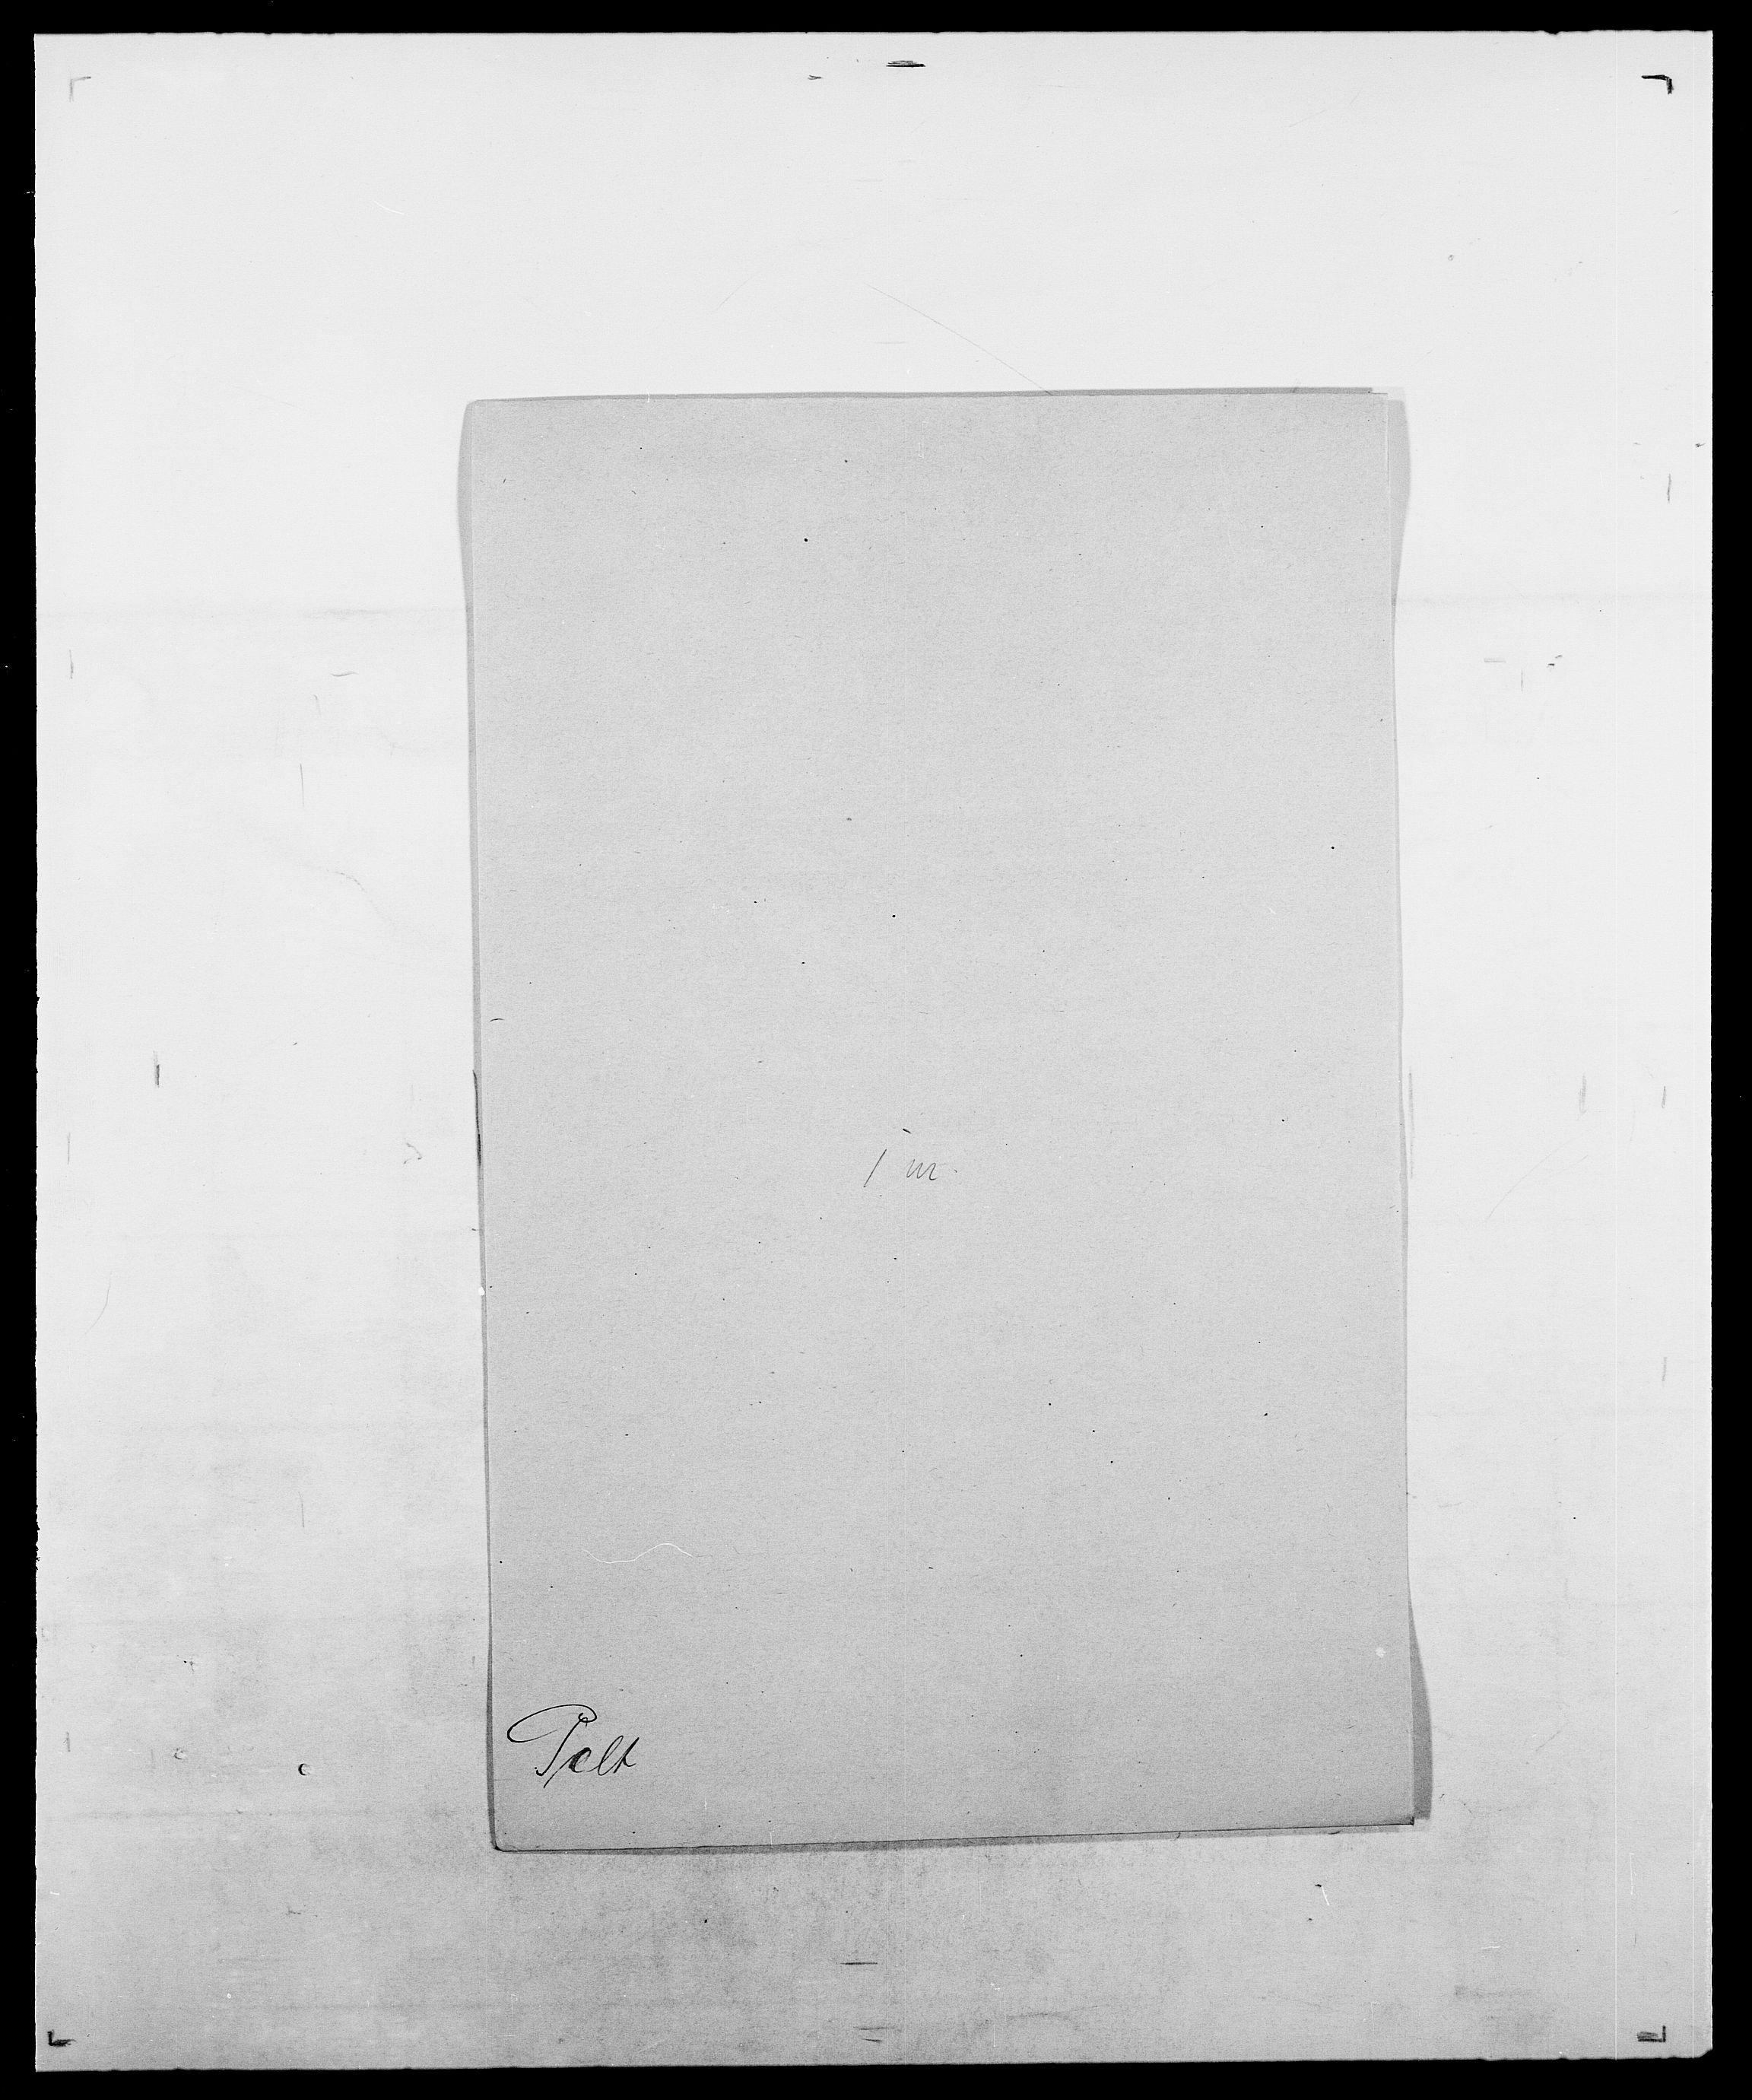 SAO, Delgobe, Charles Antoine - samling, D/Da/L0030: Paars - Pittelkov, s. 339